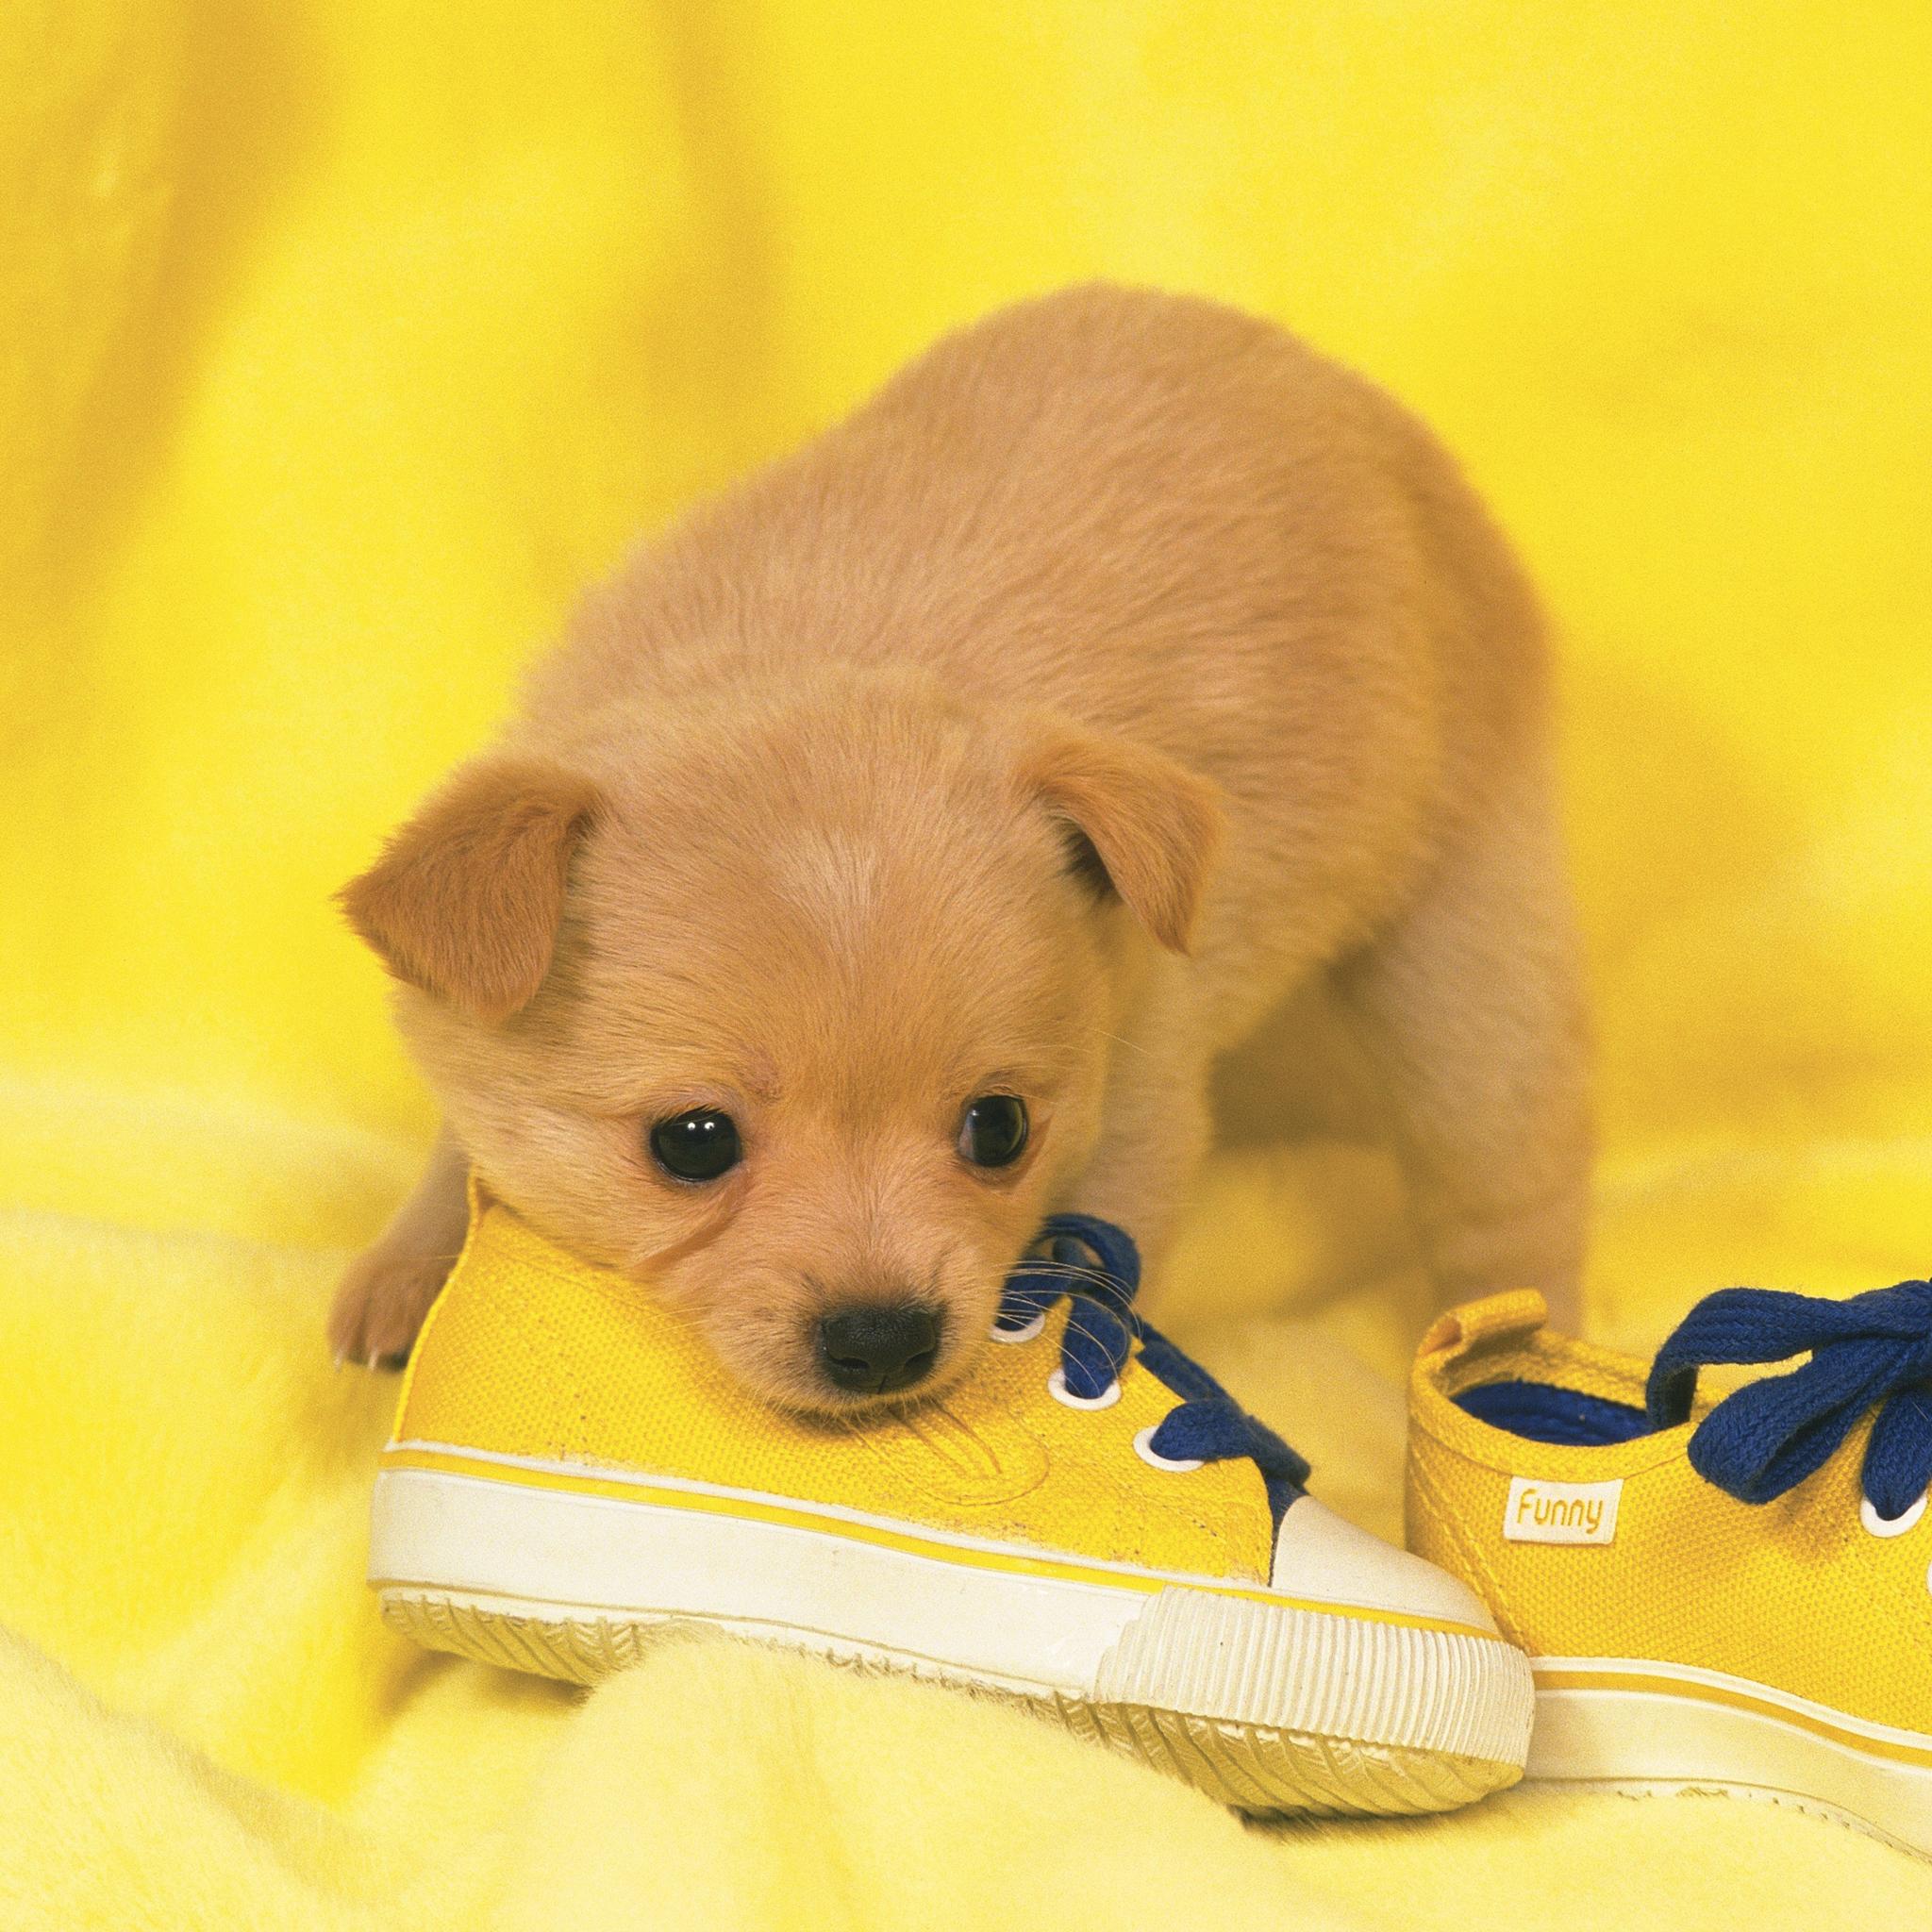 Yellow-Puppy-3Wallpapers-iPad-Retina